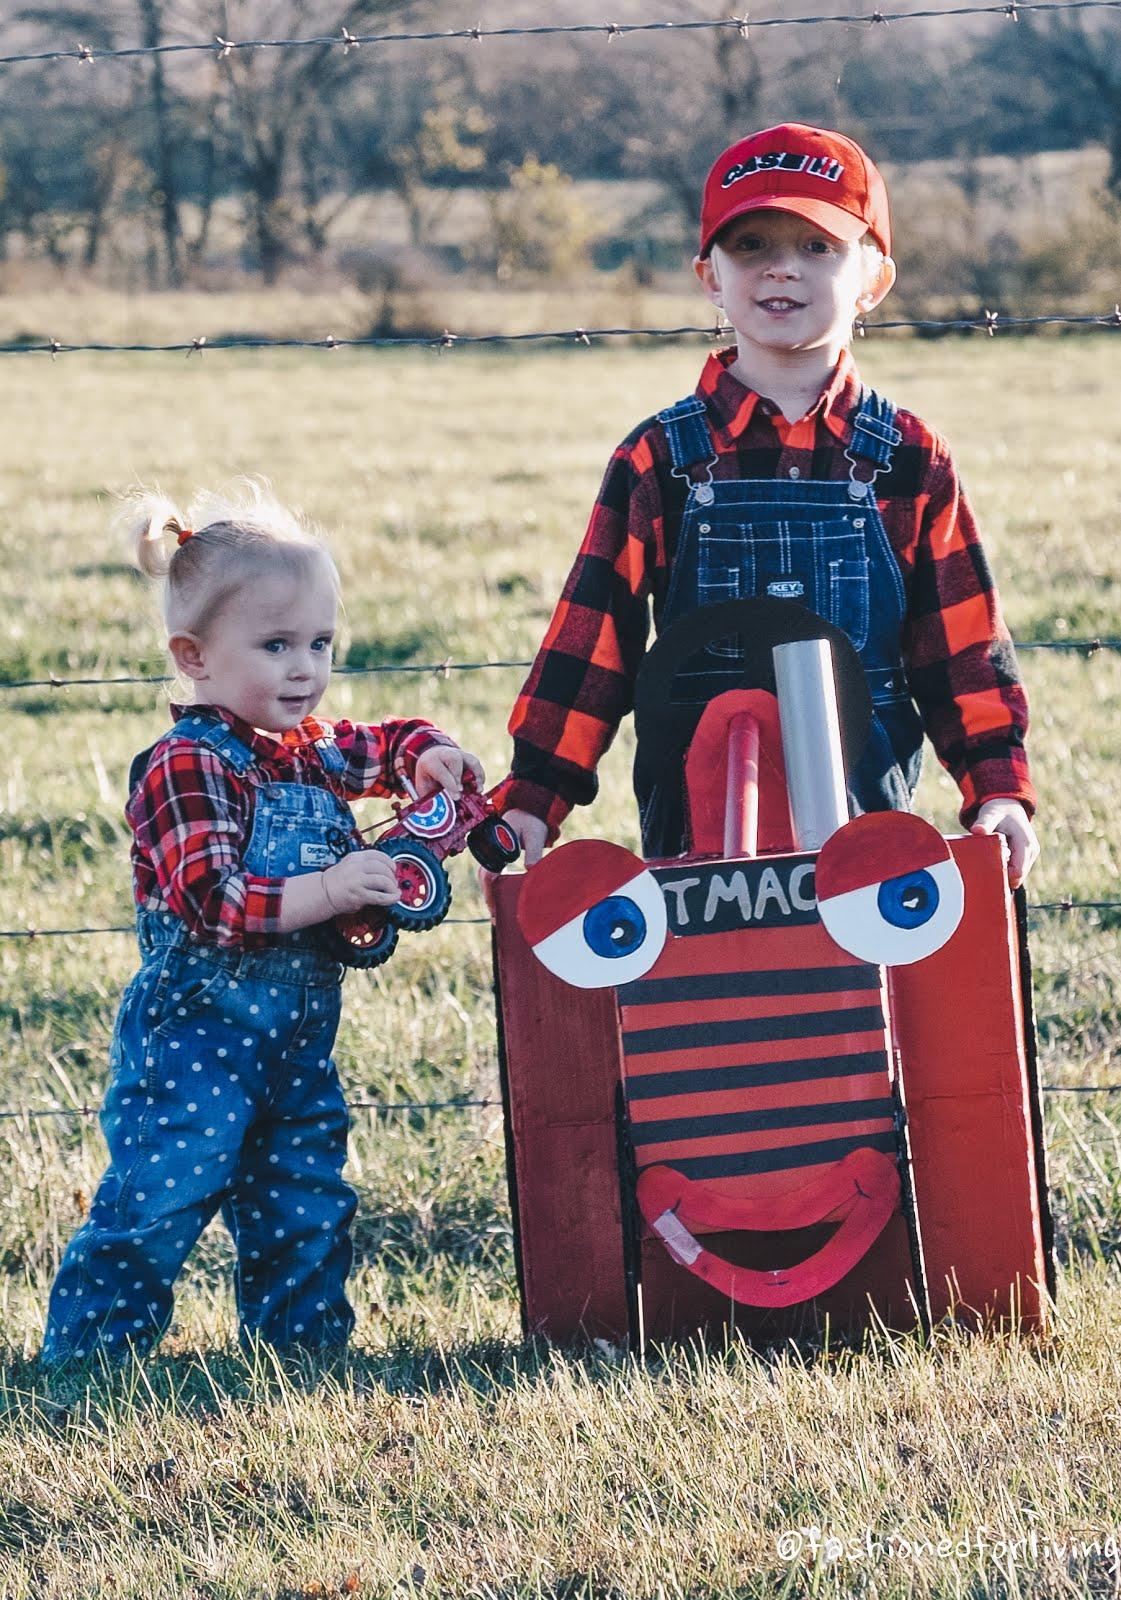 fun halloween costumes for siblings to wear together cafemom fun halloween costumes for siblings to wear together big sister little sister shirts ebay